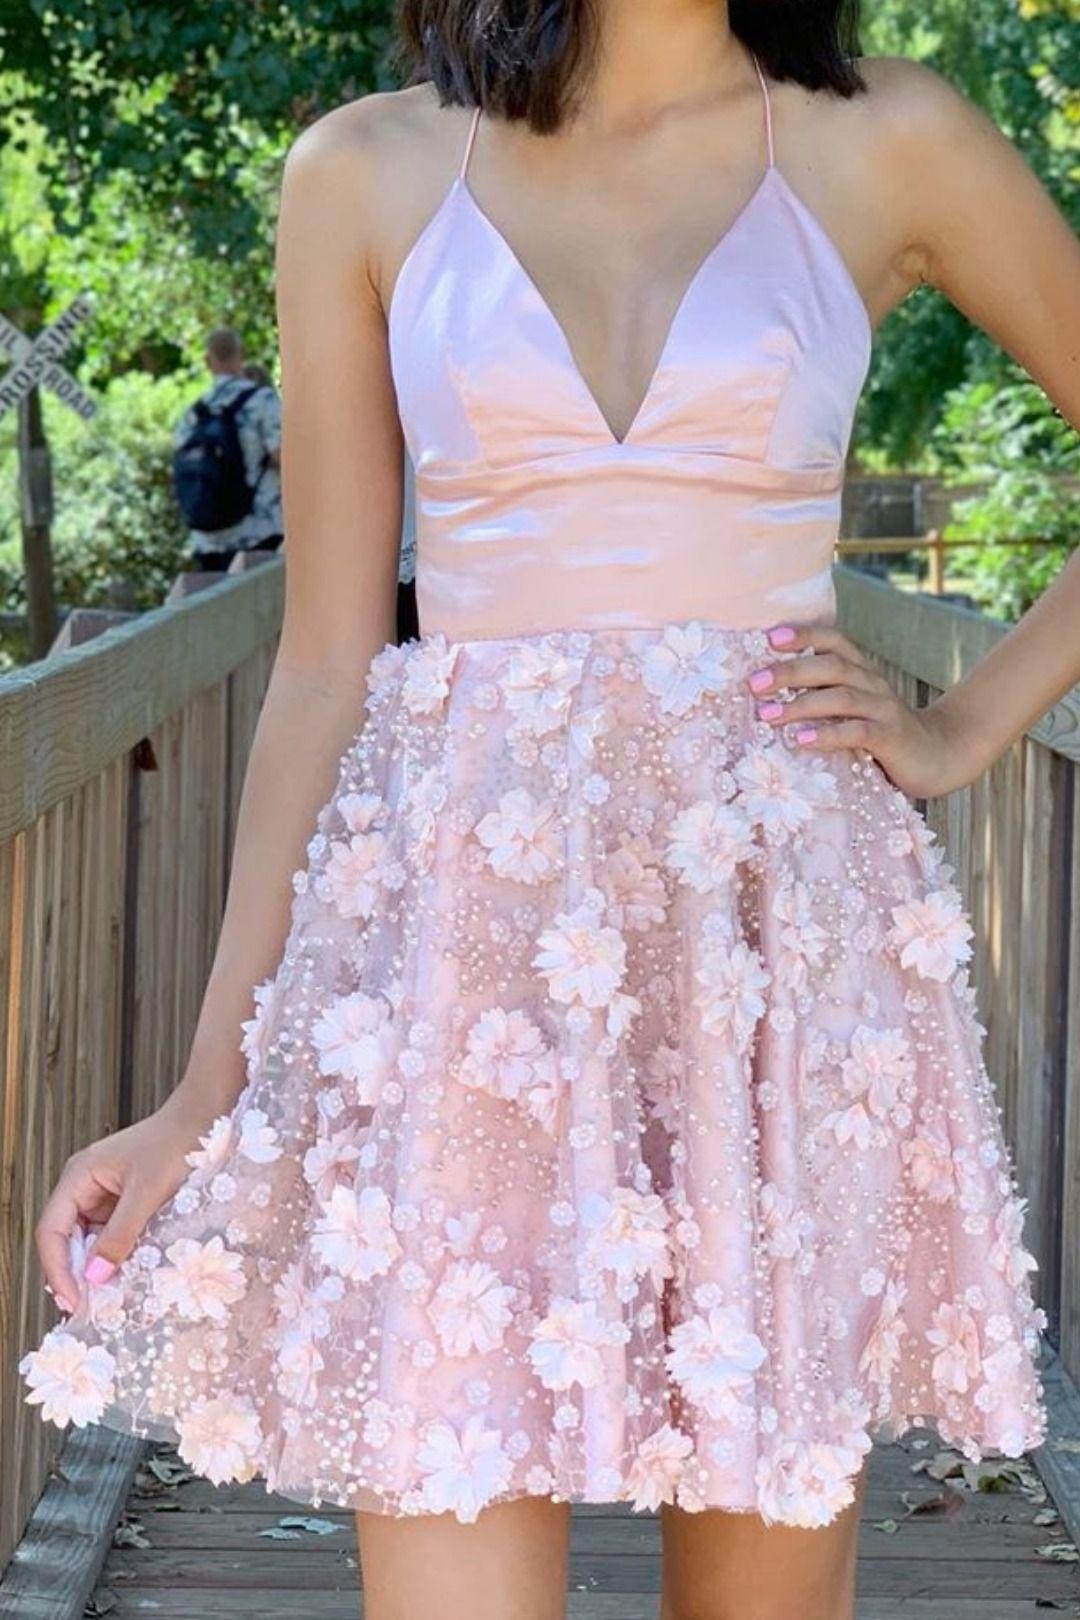 Princess Straps Short Pink Party Dress Short Pink Party Dresses Pink Party Dresses Pink Homecoming Dress [ 1620 x 1080 Pixel ]